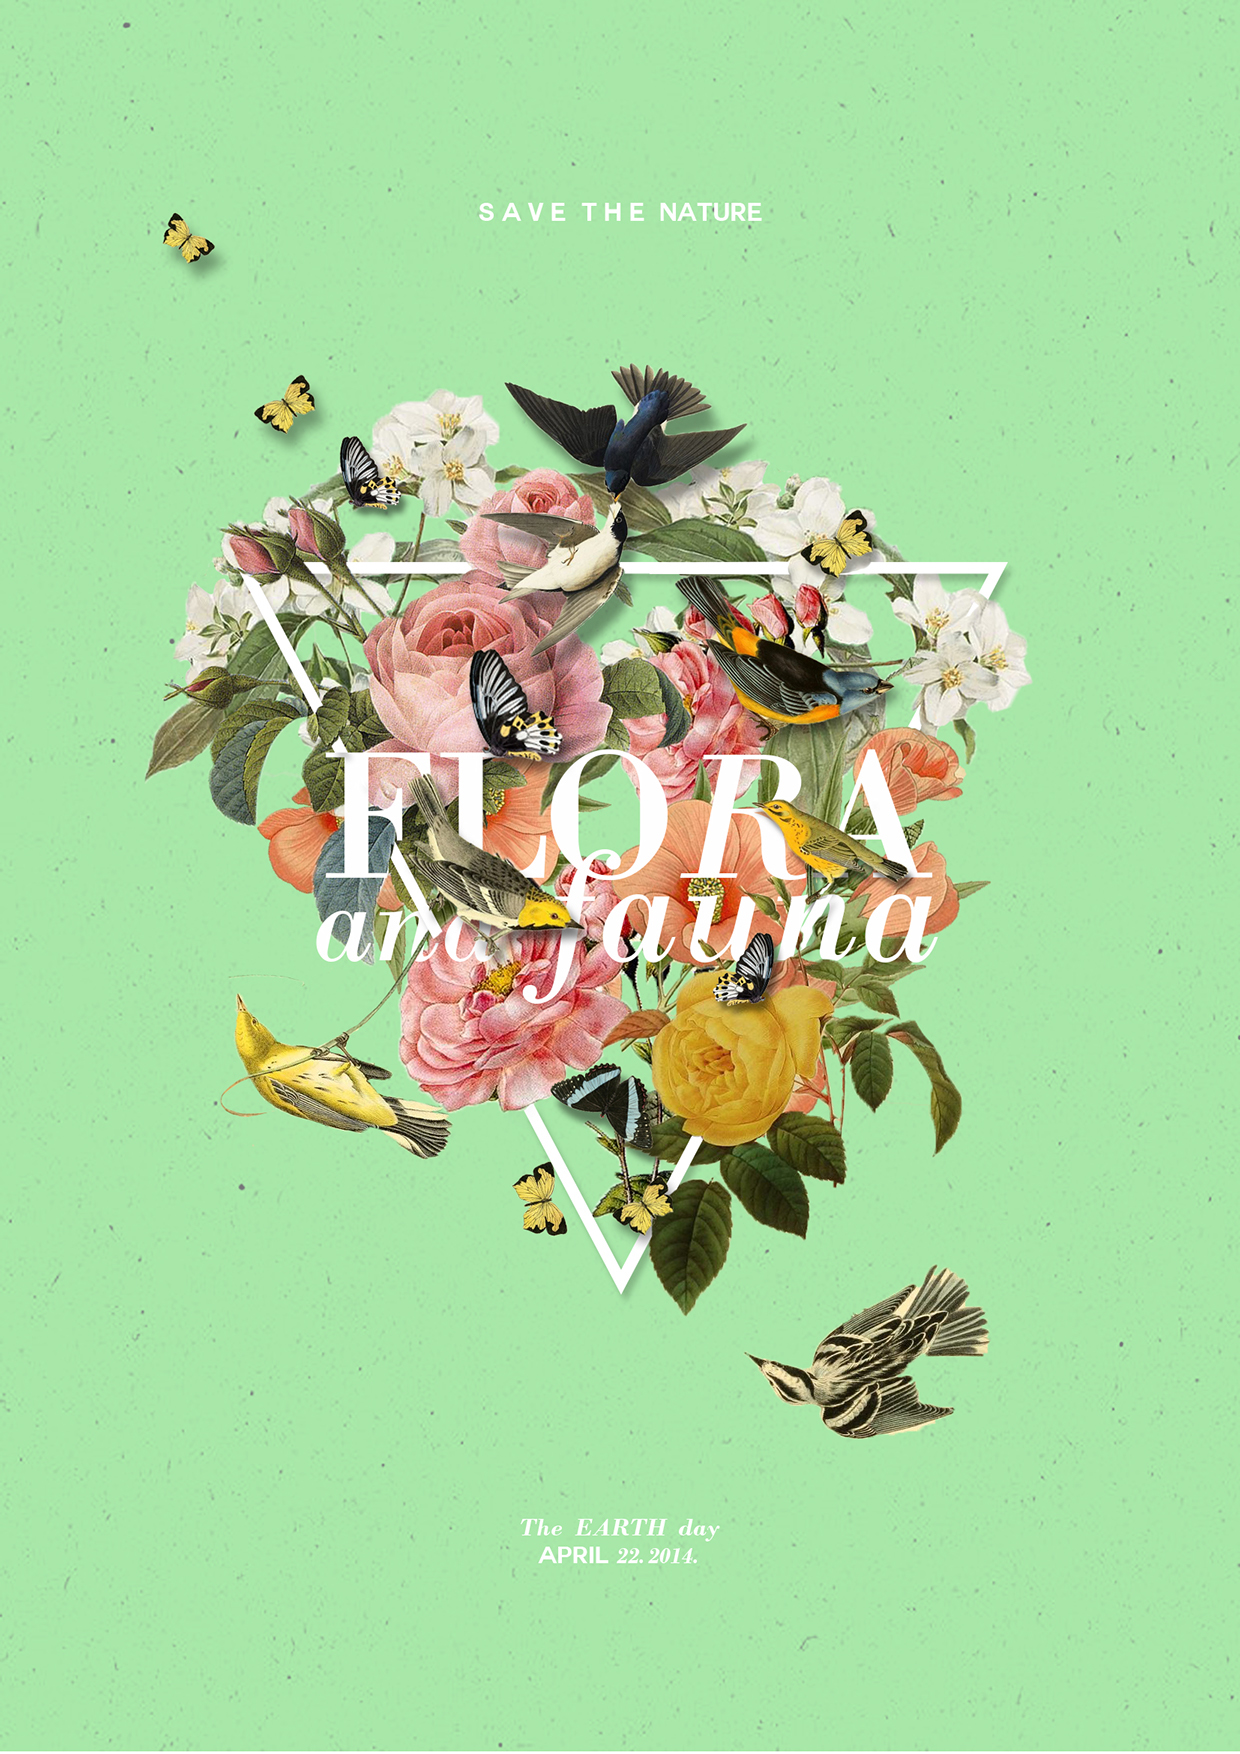 Poster design inspiration 2015 - Poster Design Inspiration 2015 Flora